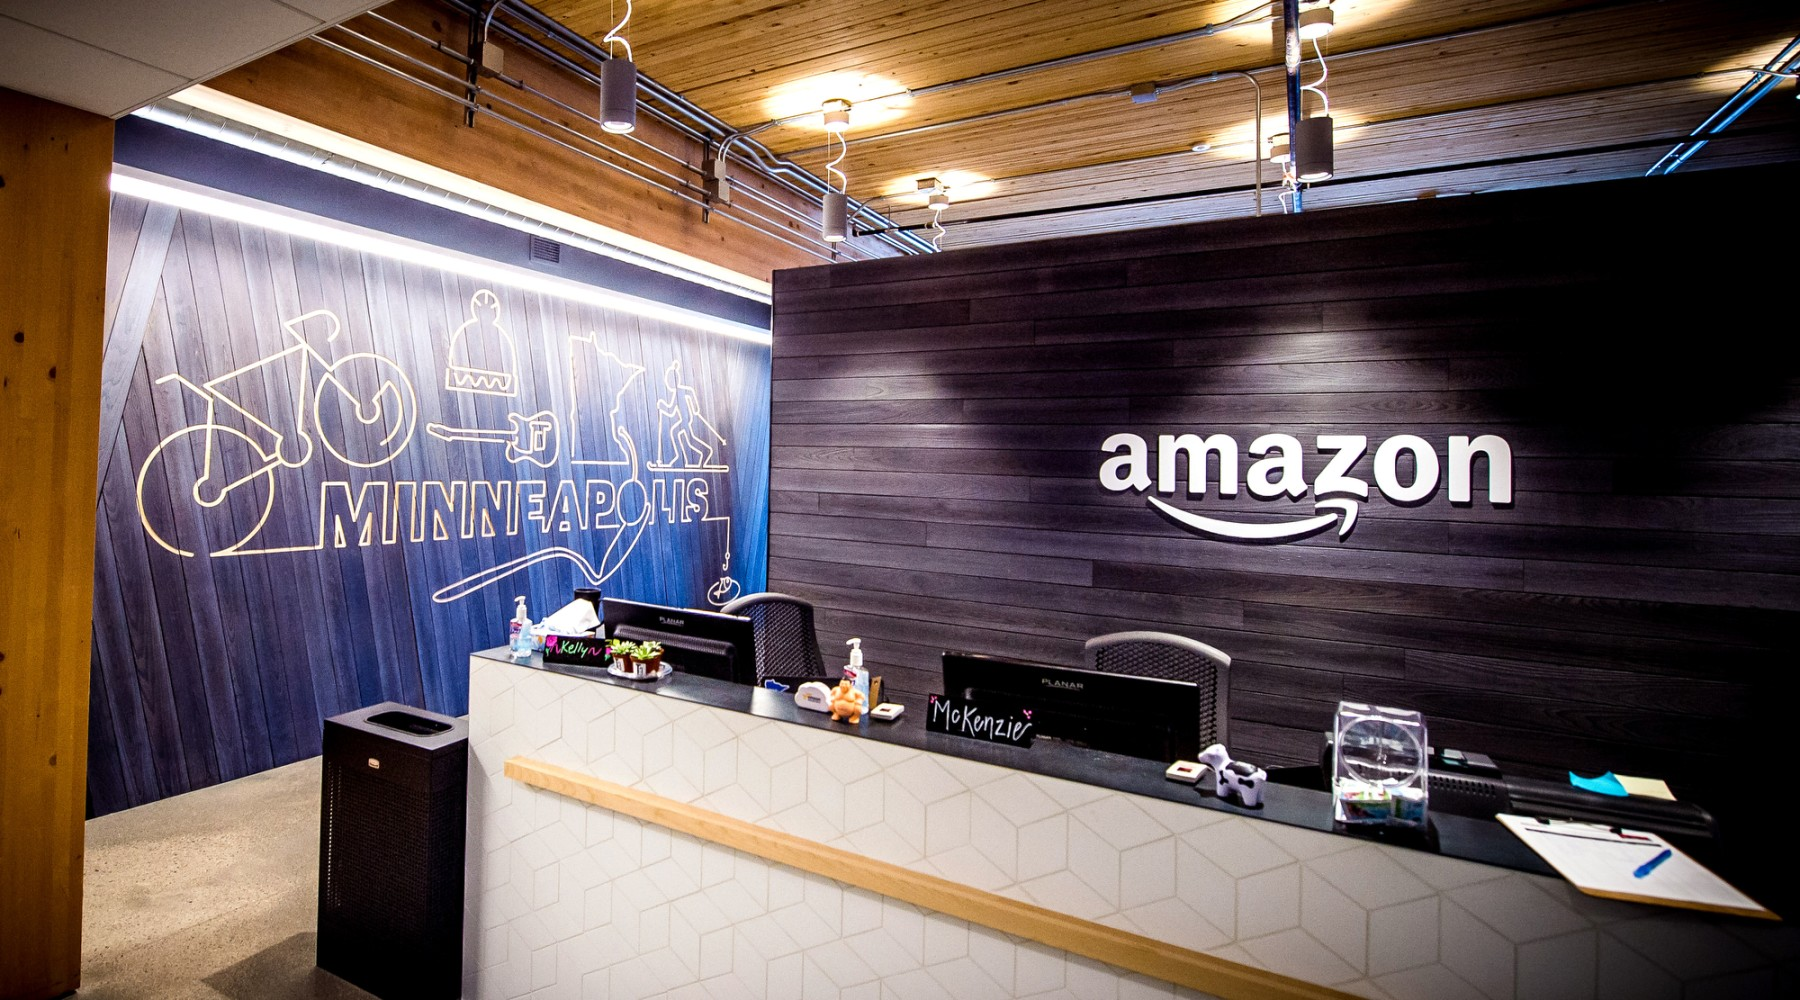 Amazon office in Minneapolis, via blog.aboutamazon.com